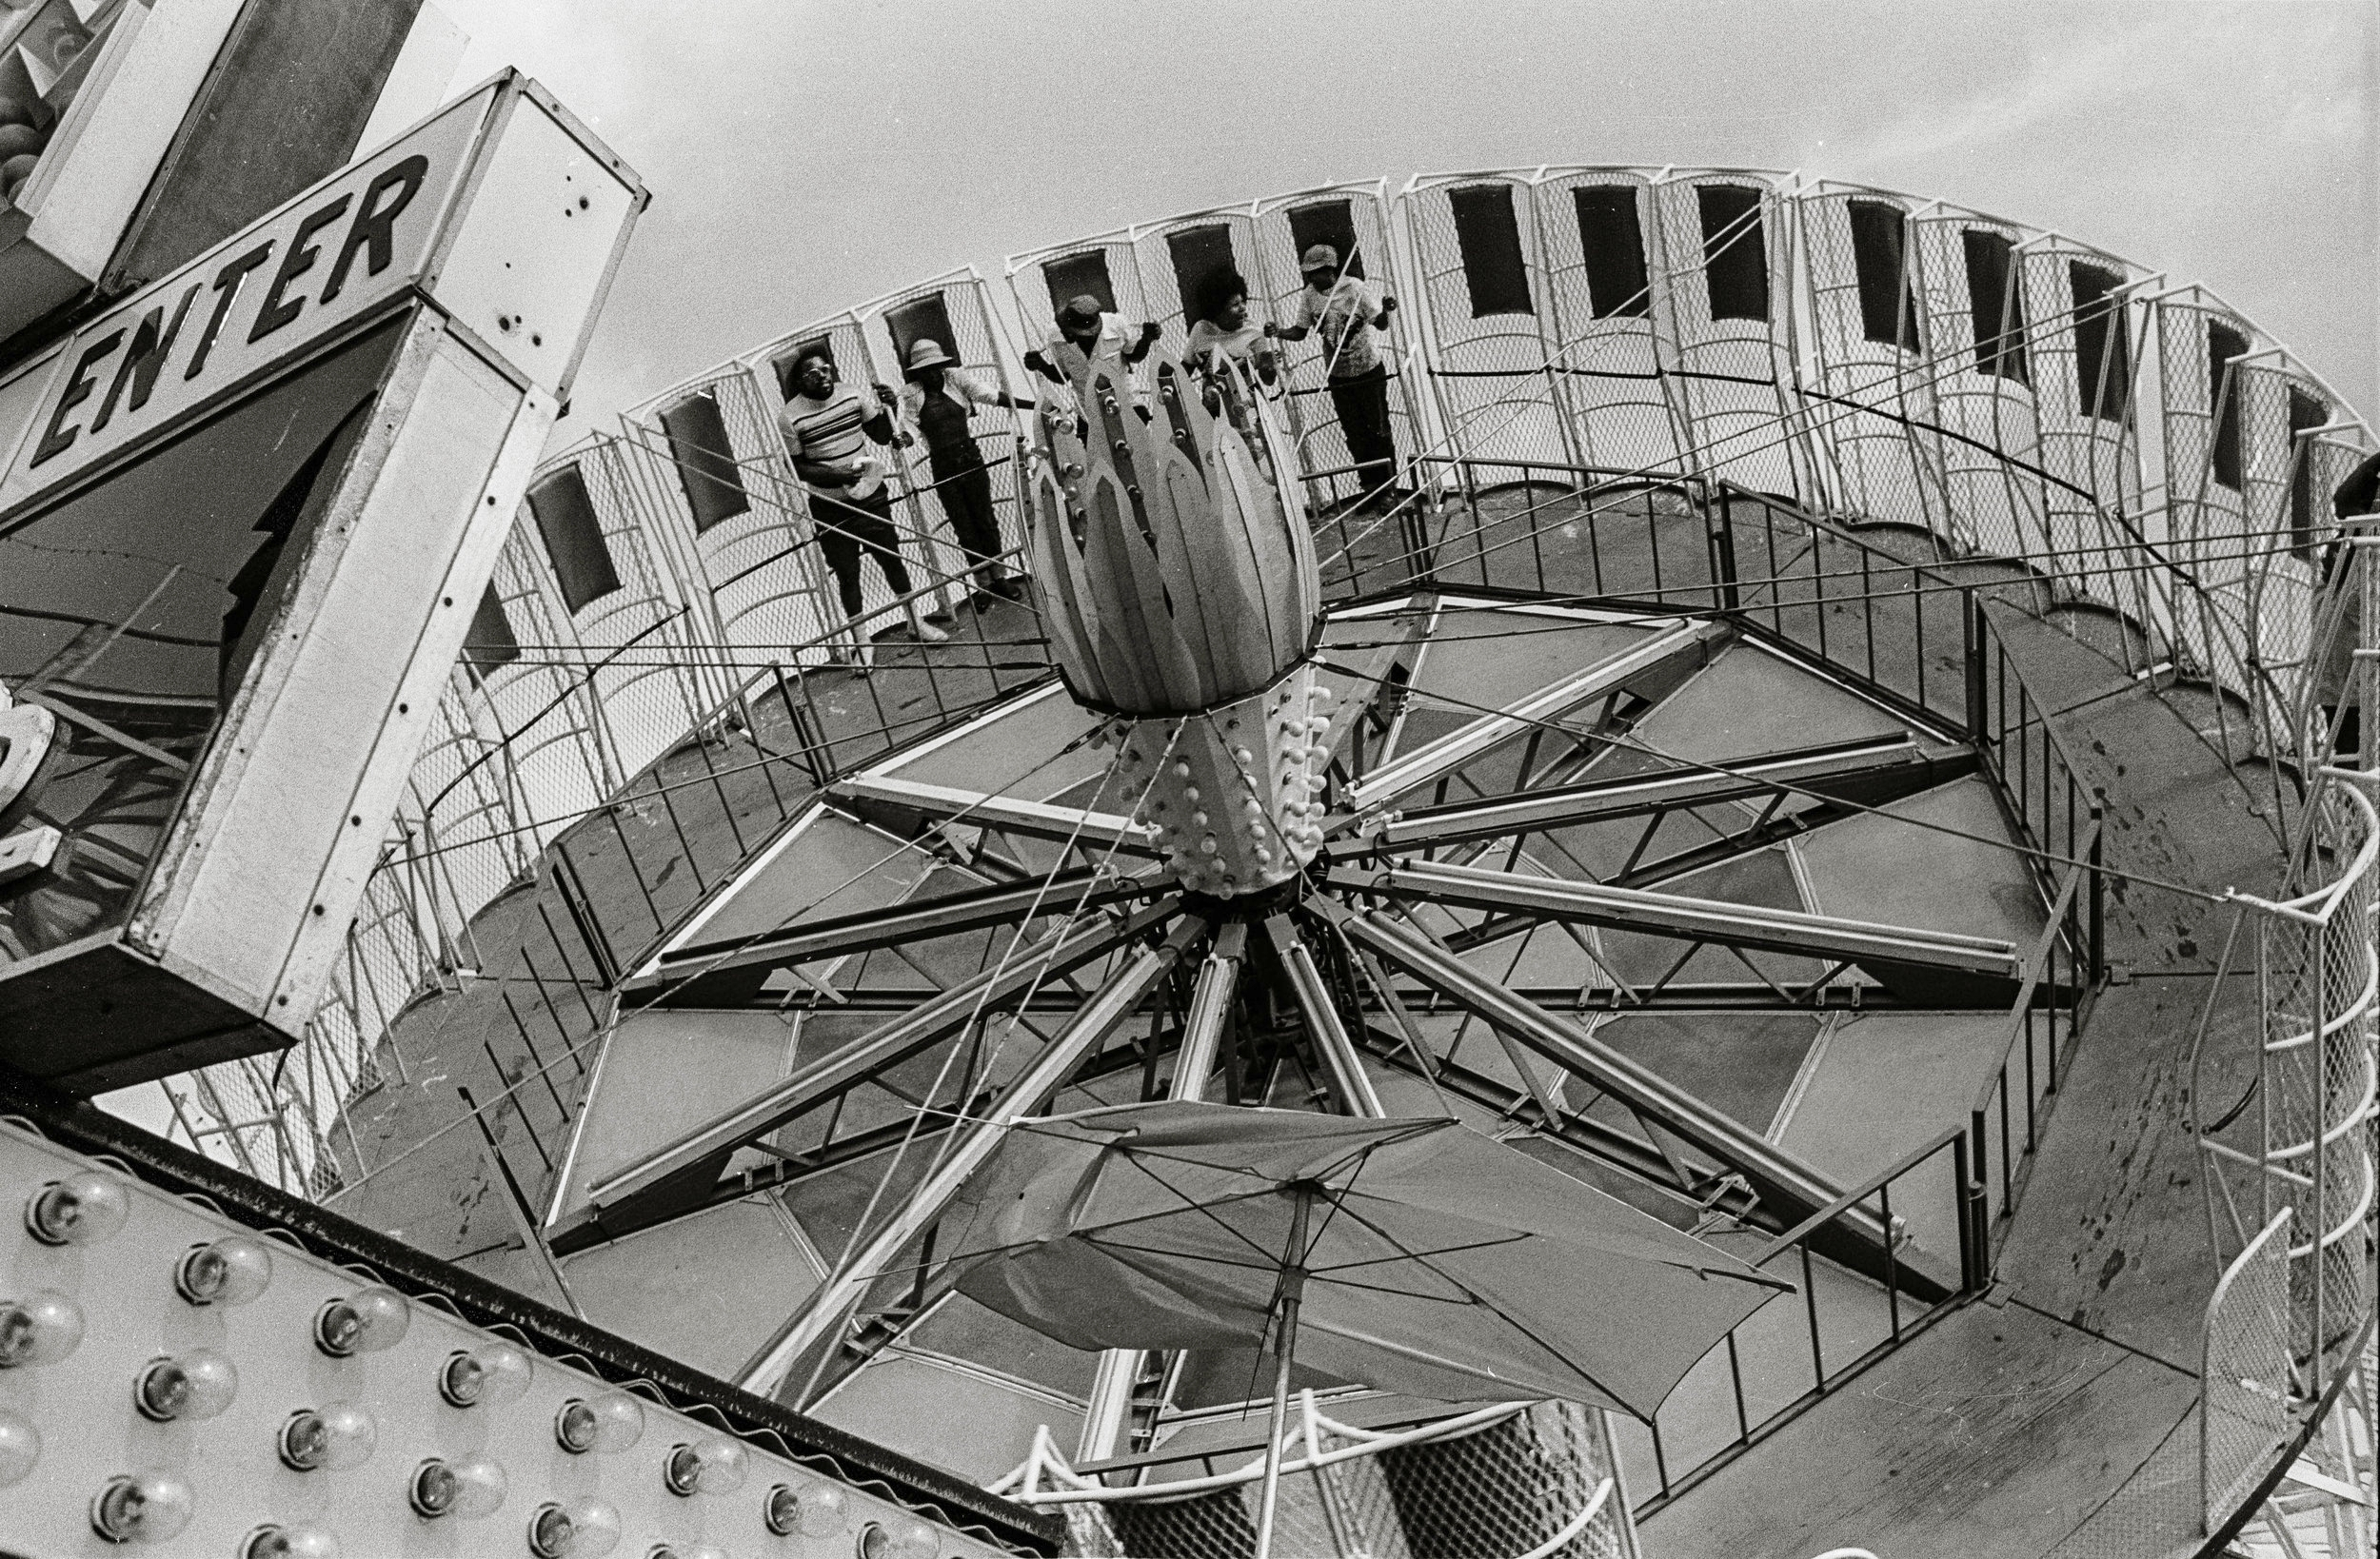 Amusement Ride, CT, 1973